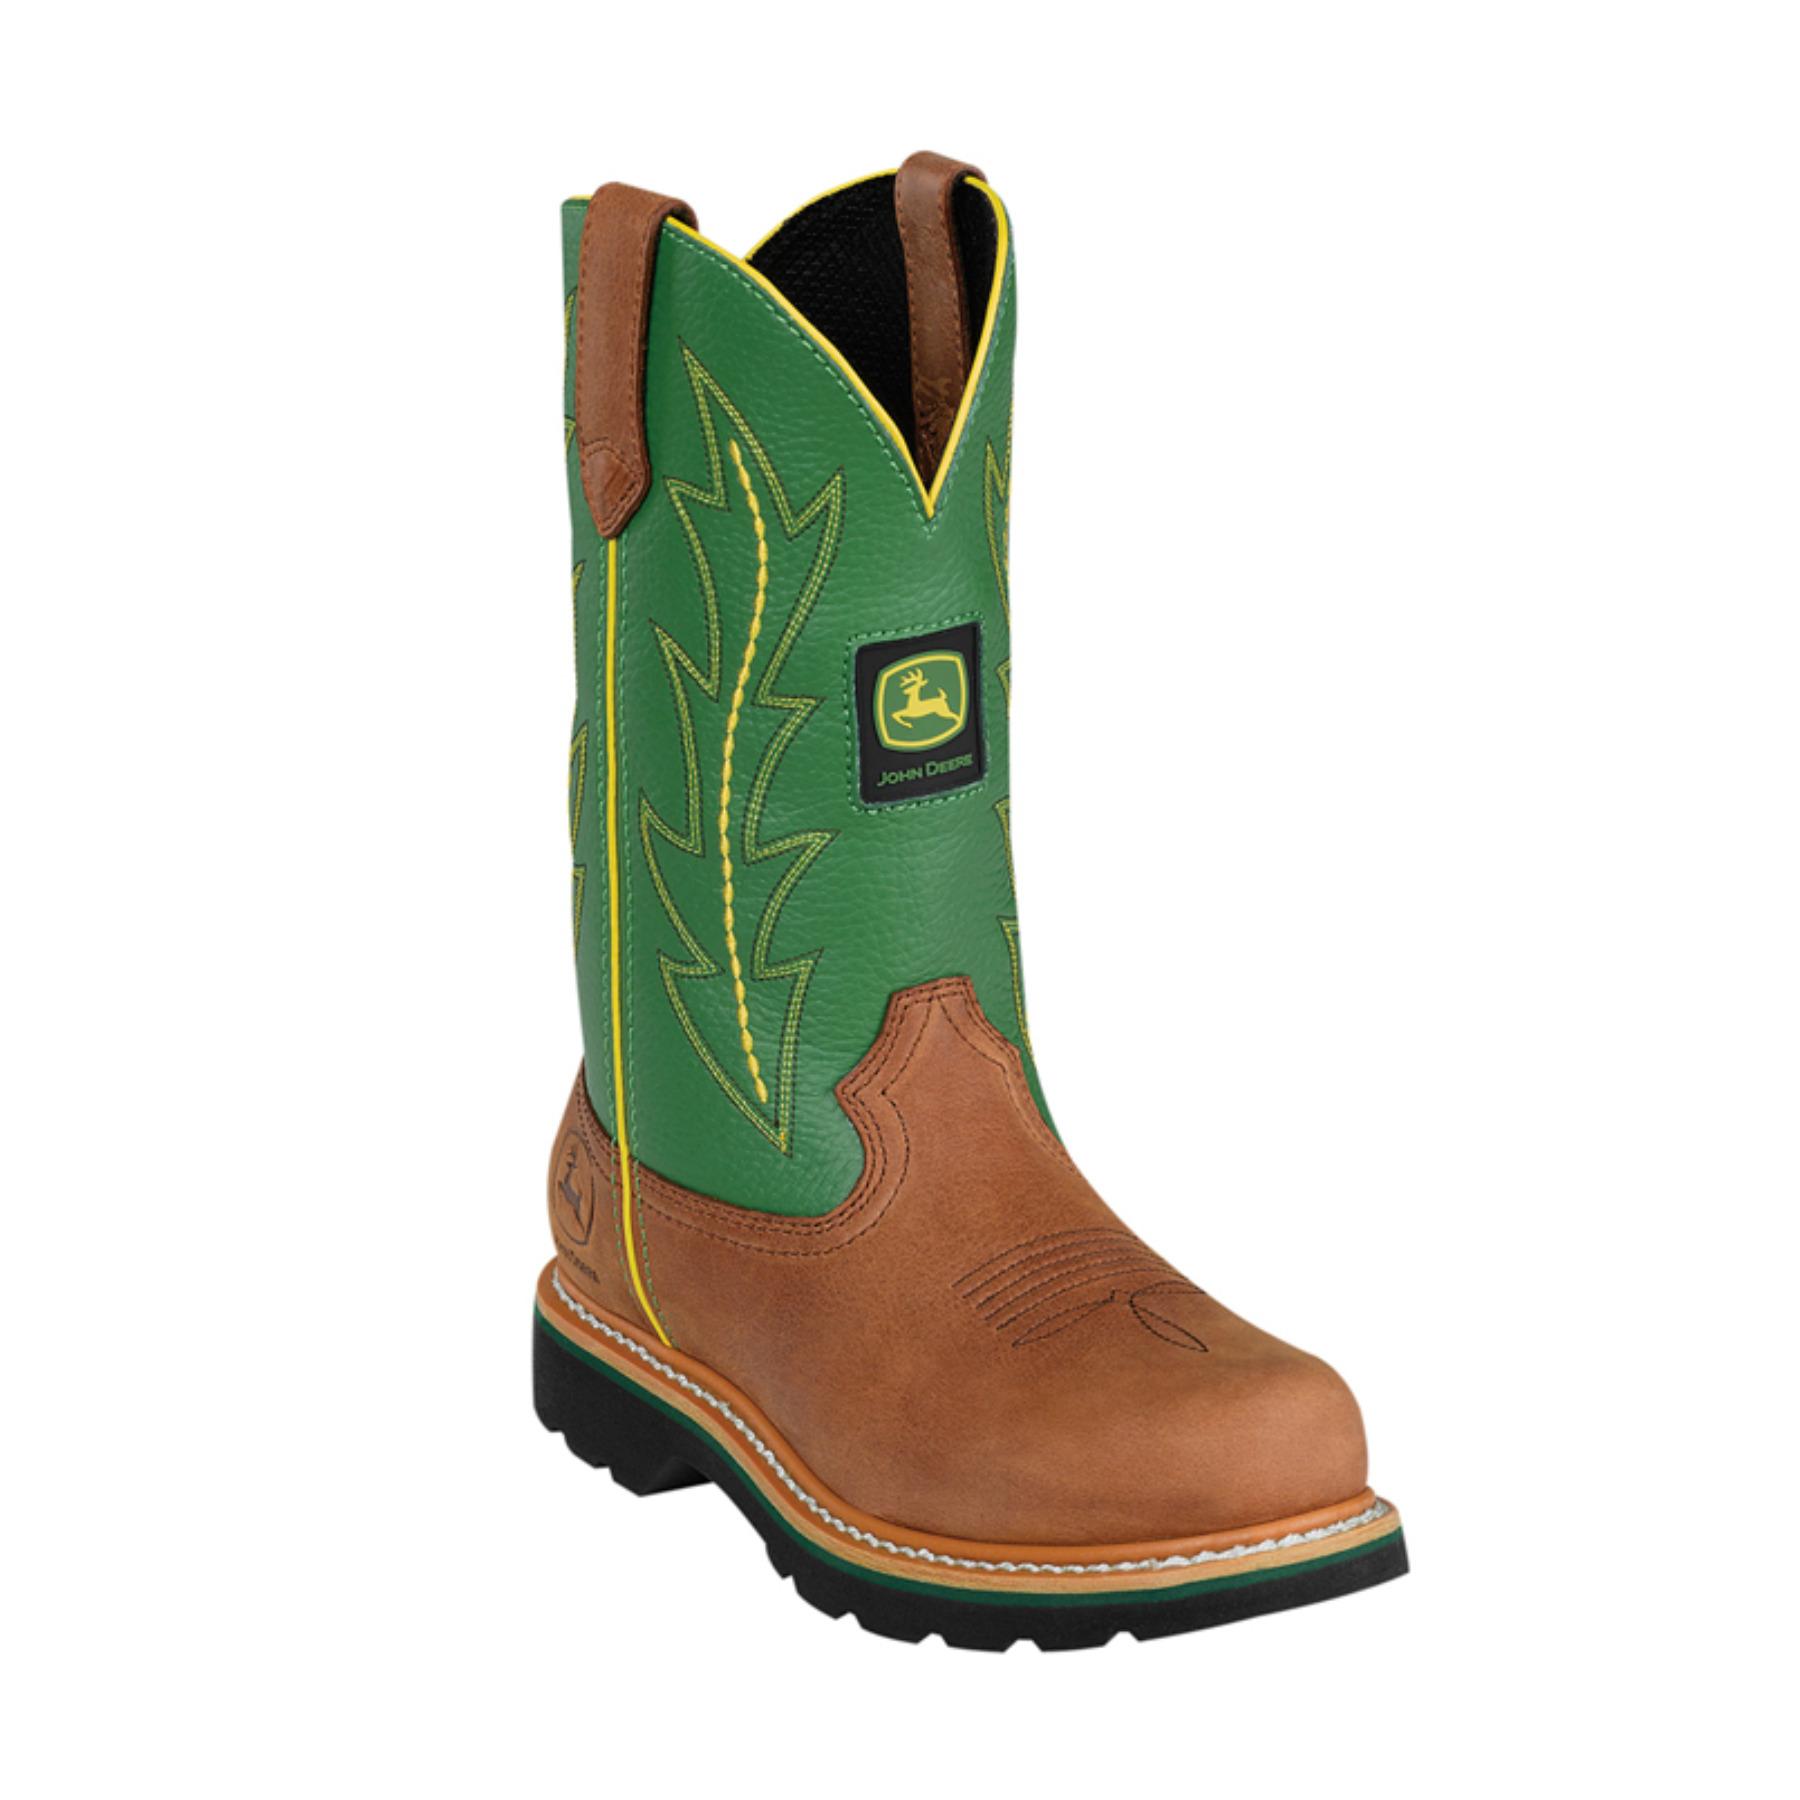 John Deere John Deere Pull-On Ladies Leather Boots - Green ...